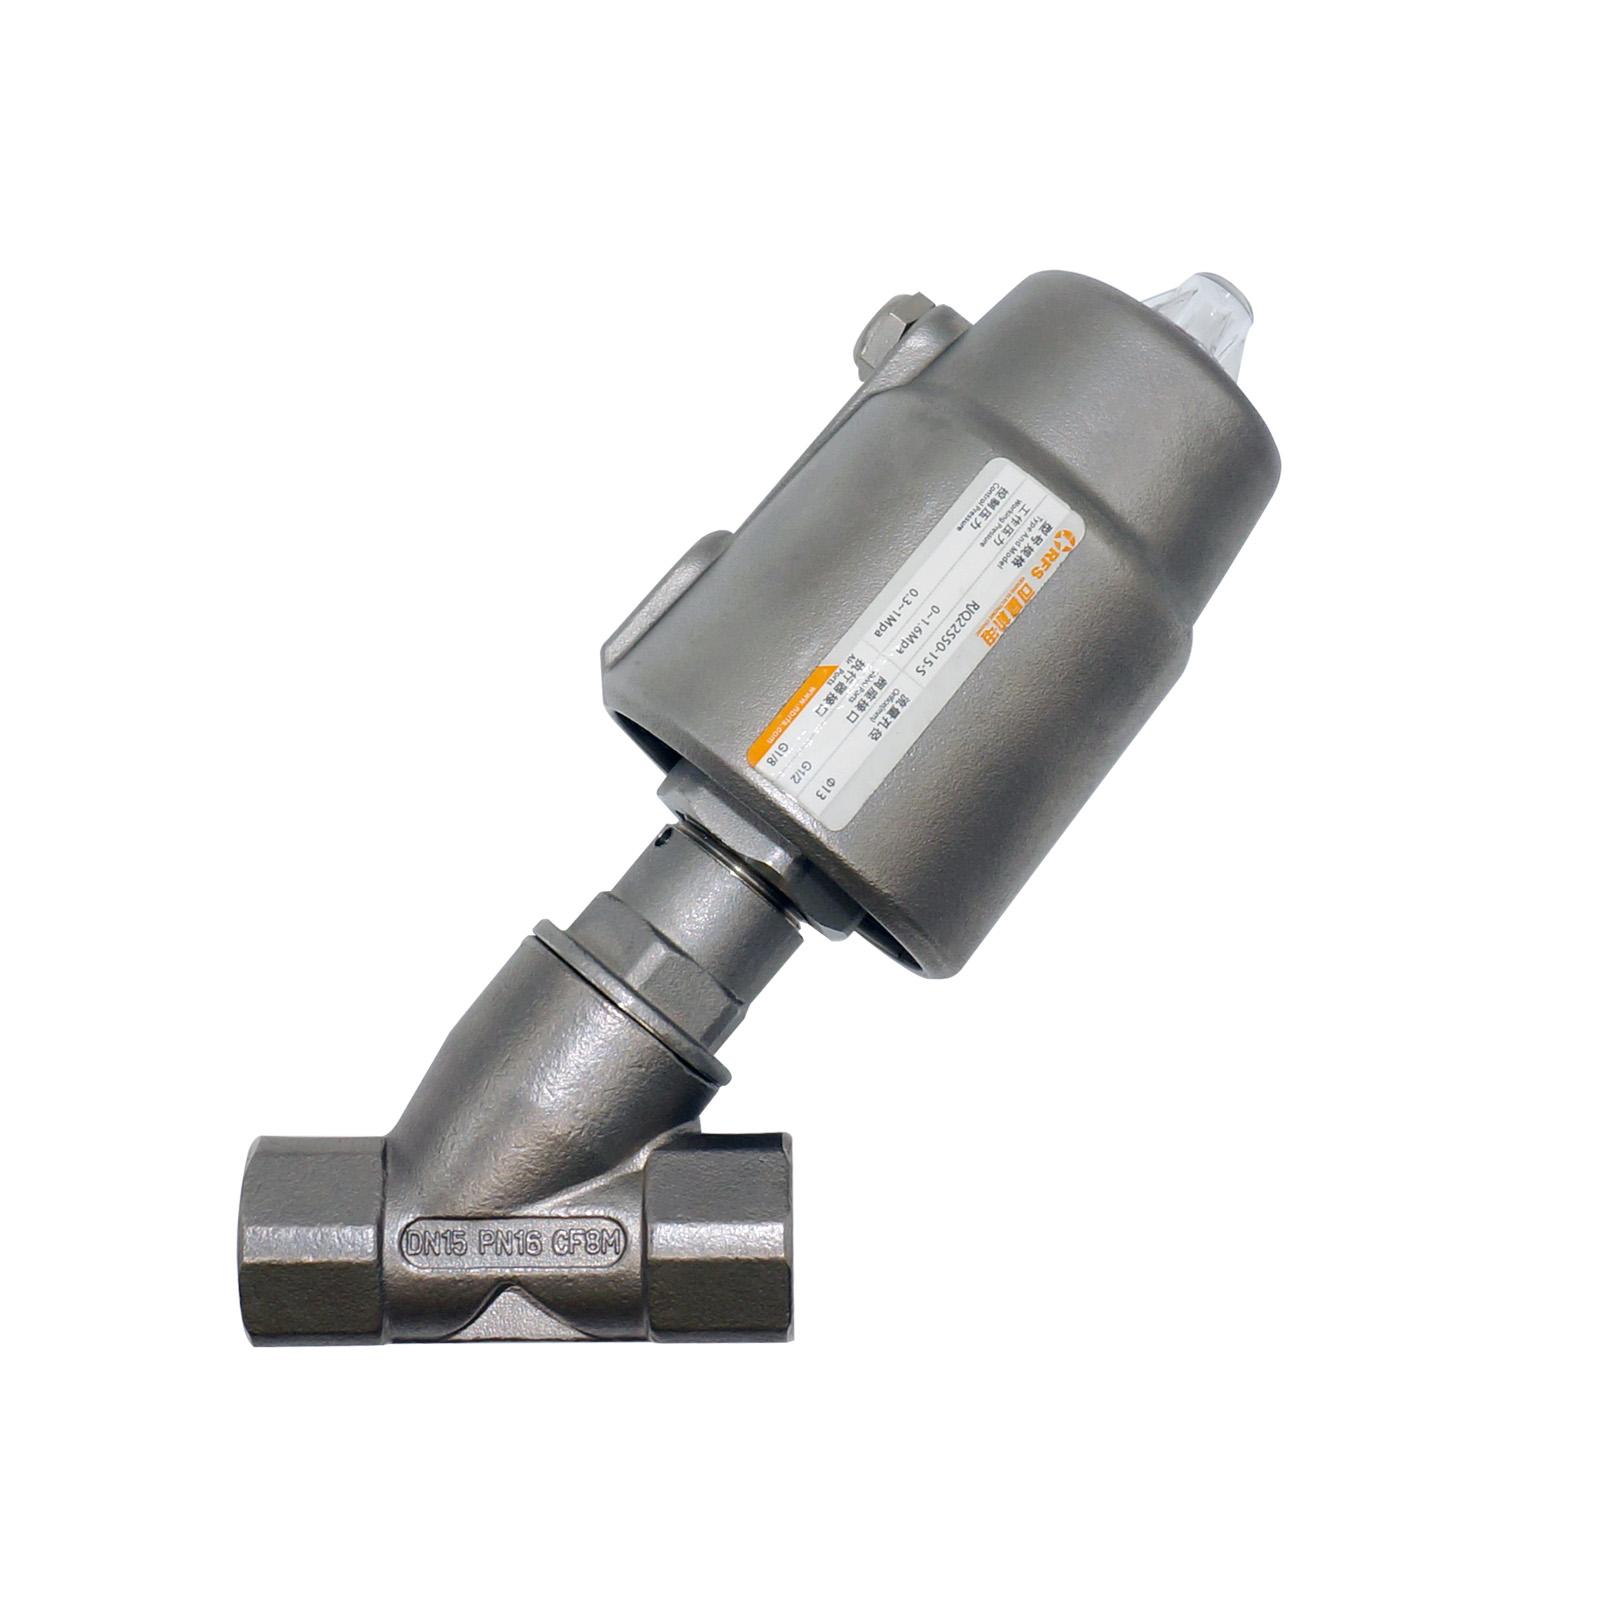 RJQ22-S不锈钢头执行器气控斜角阀